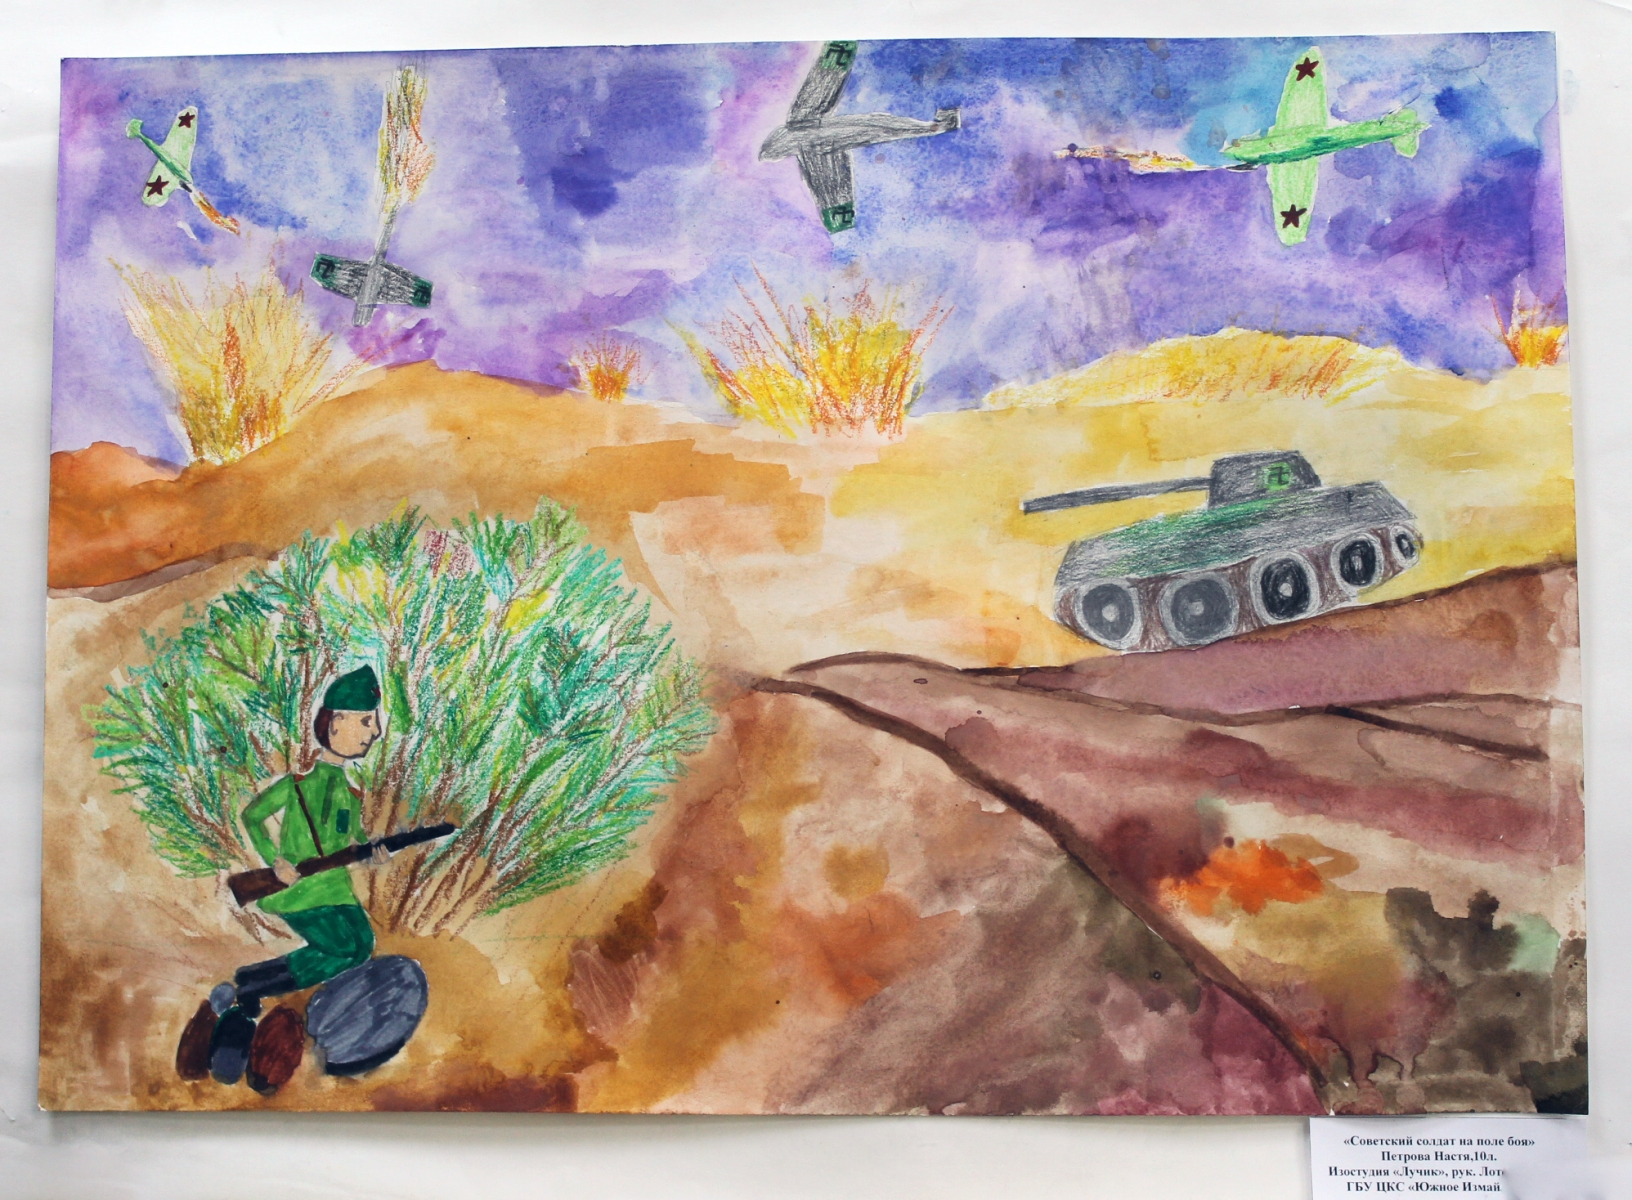 Петрова Настя 10 лет Советский солдат на поле боя